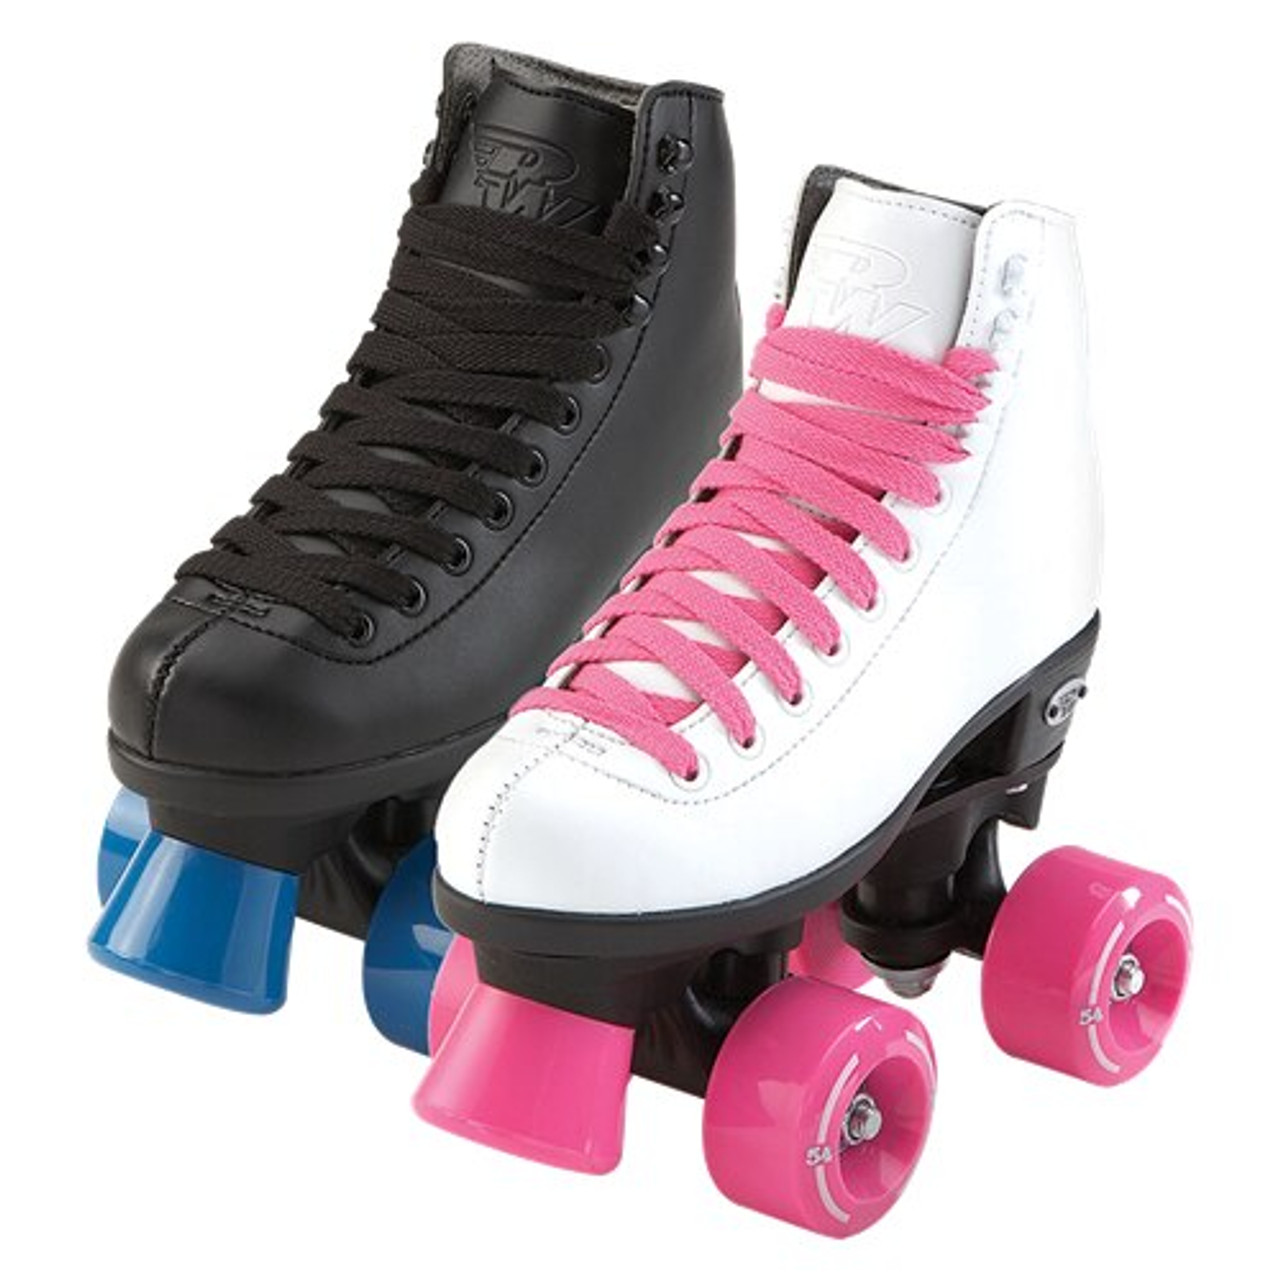 Quad Roller Skates | Wave | Riedell | Discountskatewear.com